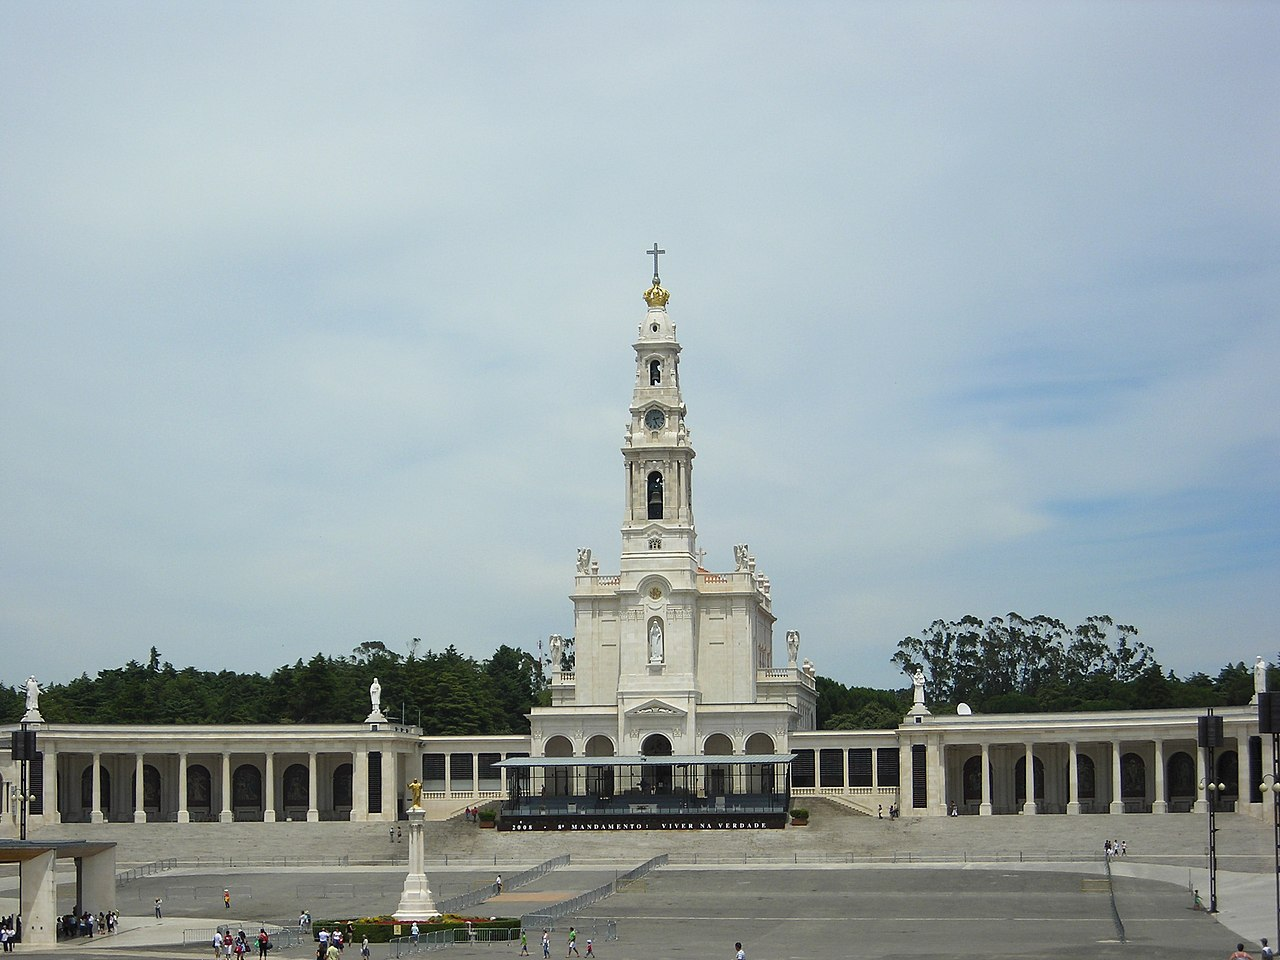 Santuário de Fátima (36) - Jul 2008 (cropped).jpg